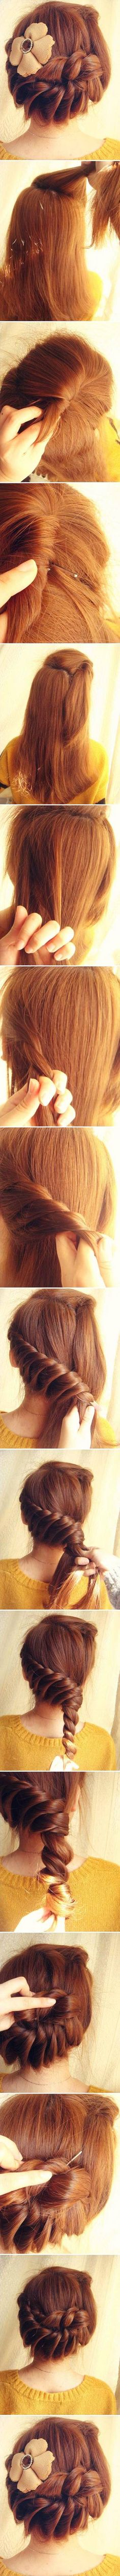 DIY Original Braid Medium Length Hair Hairstyle